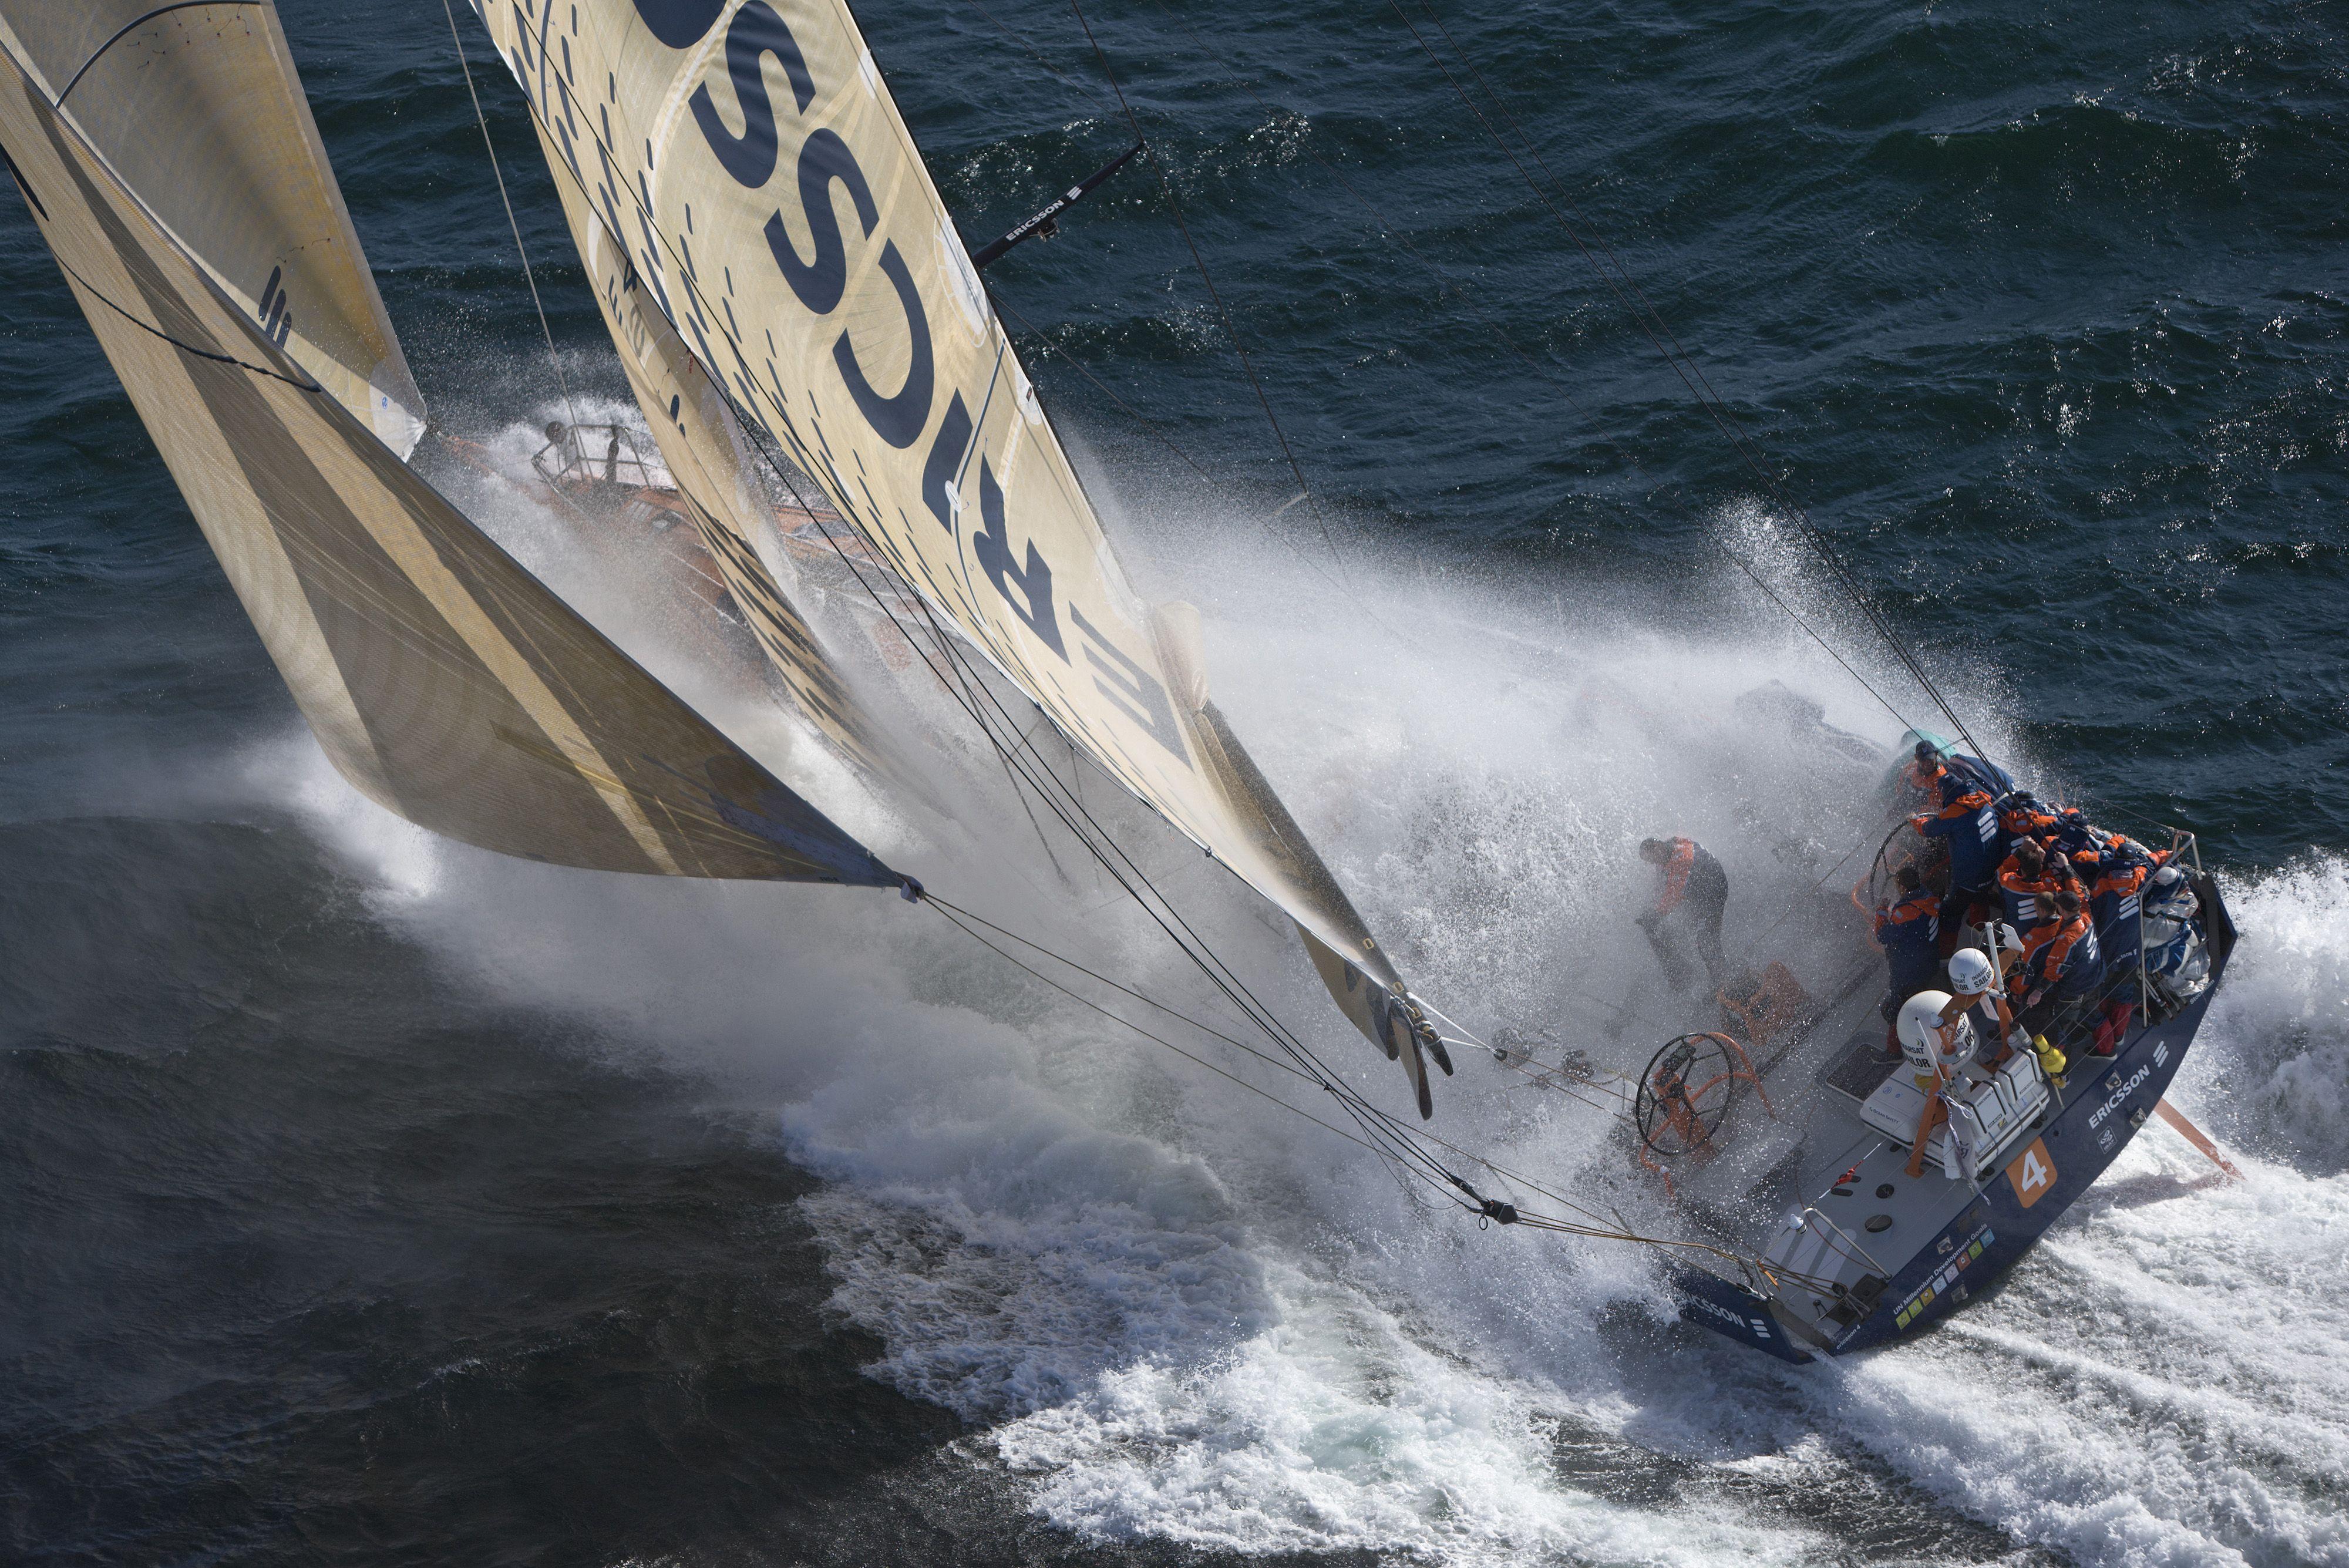 Best 25 Sailing Quotes Ideas On Pinterest: Best 25+ Volvo Ocean Race Ideas On Pinterest